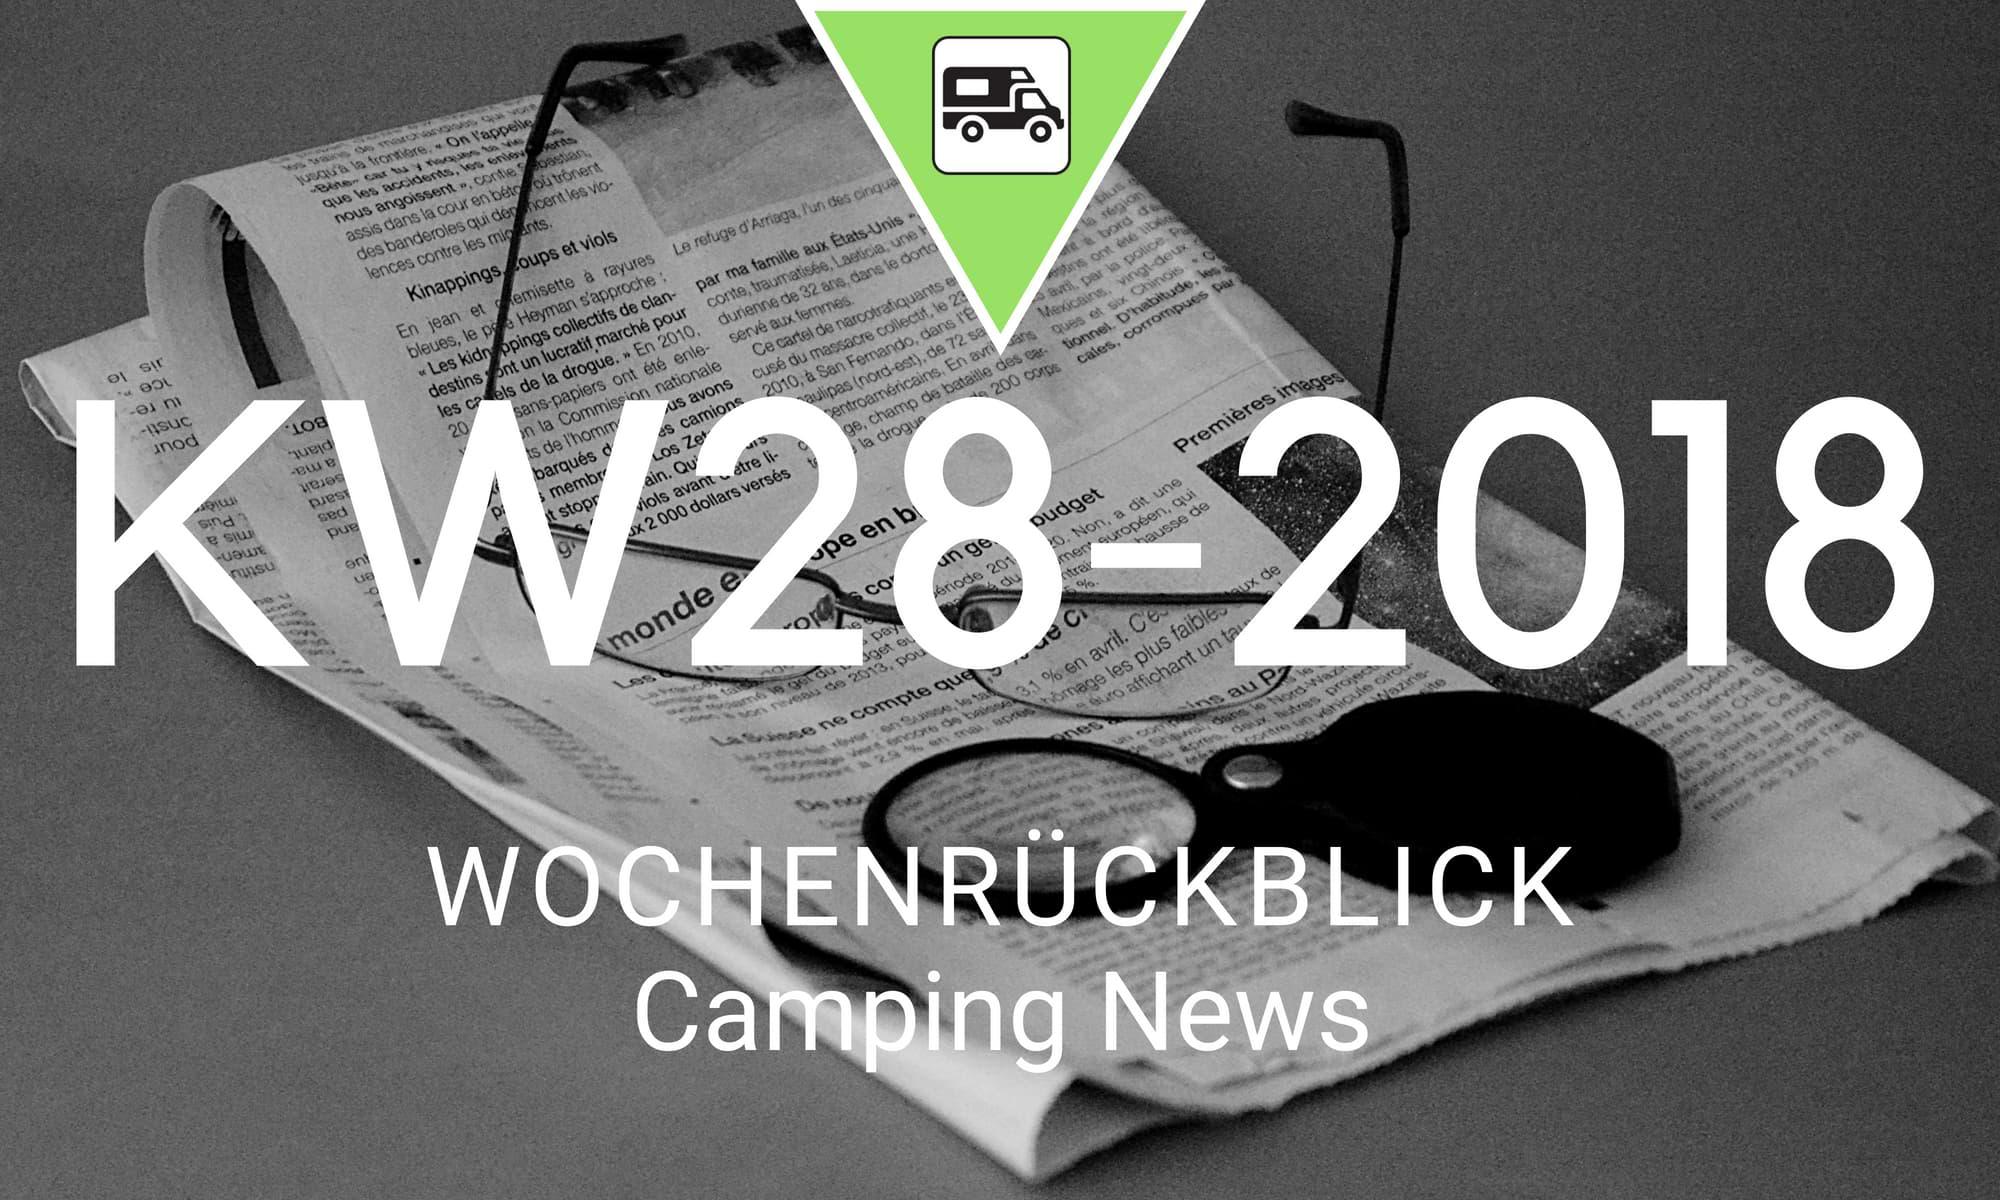 Wochenrückblick Camping News KW28-2018